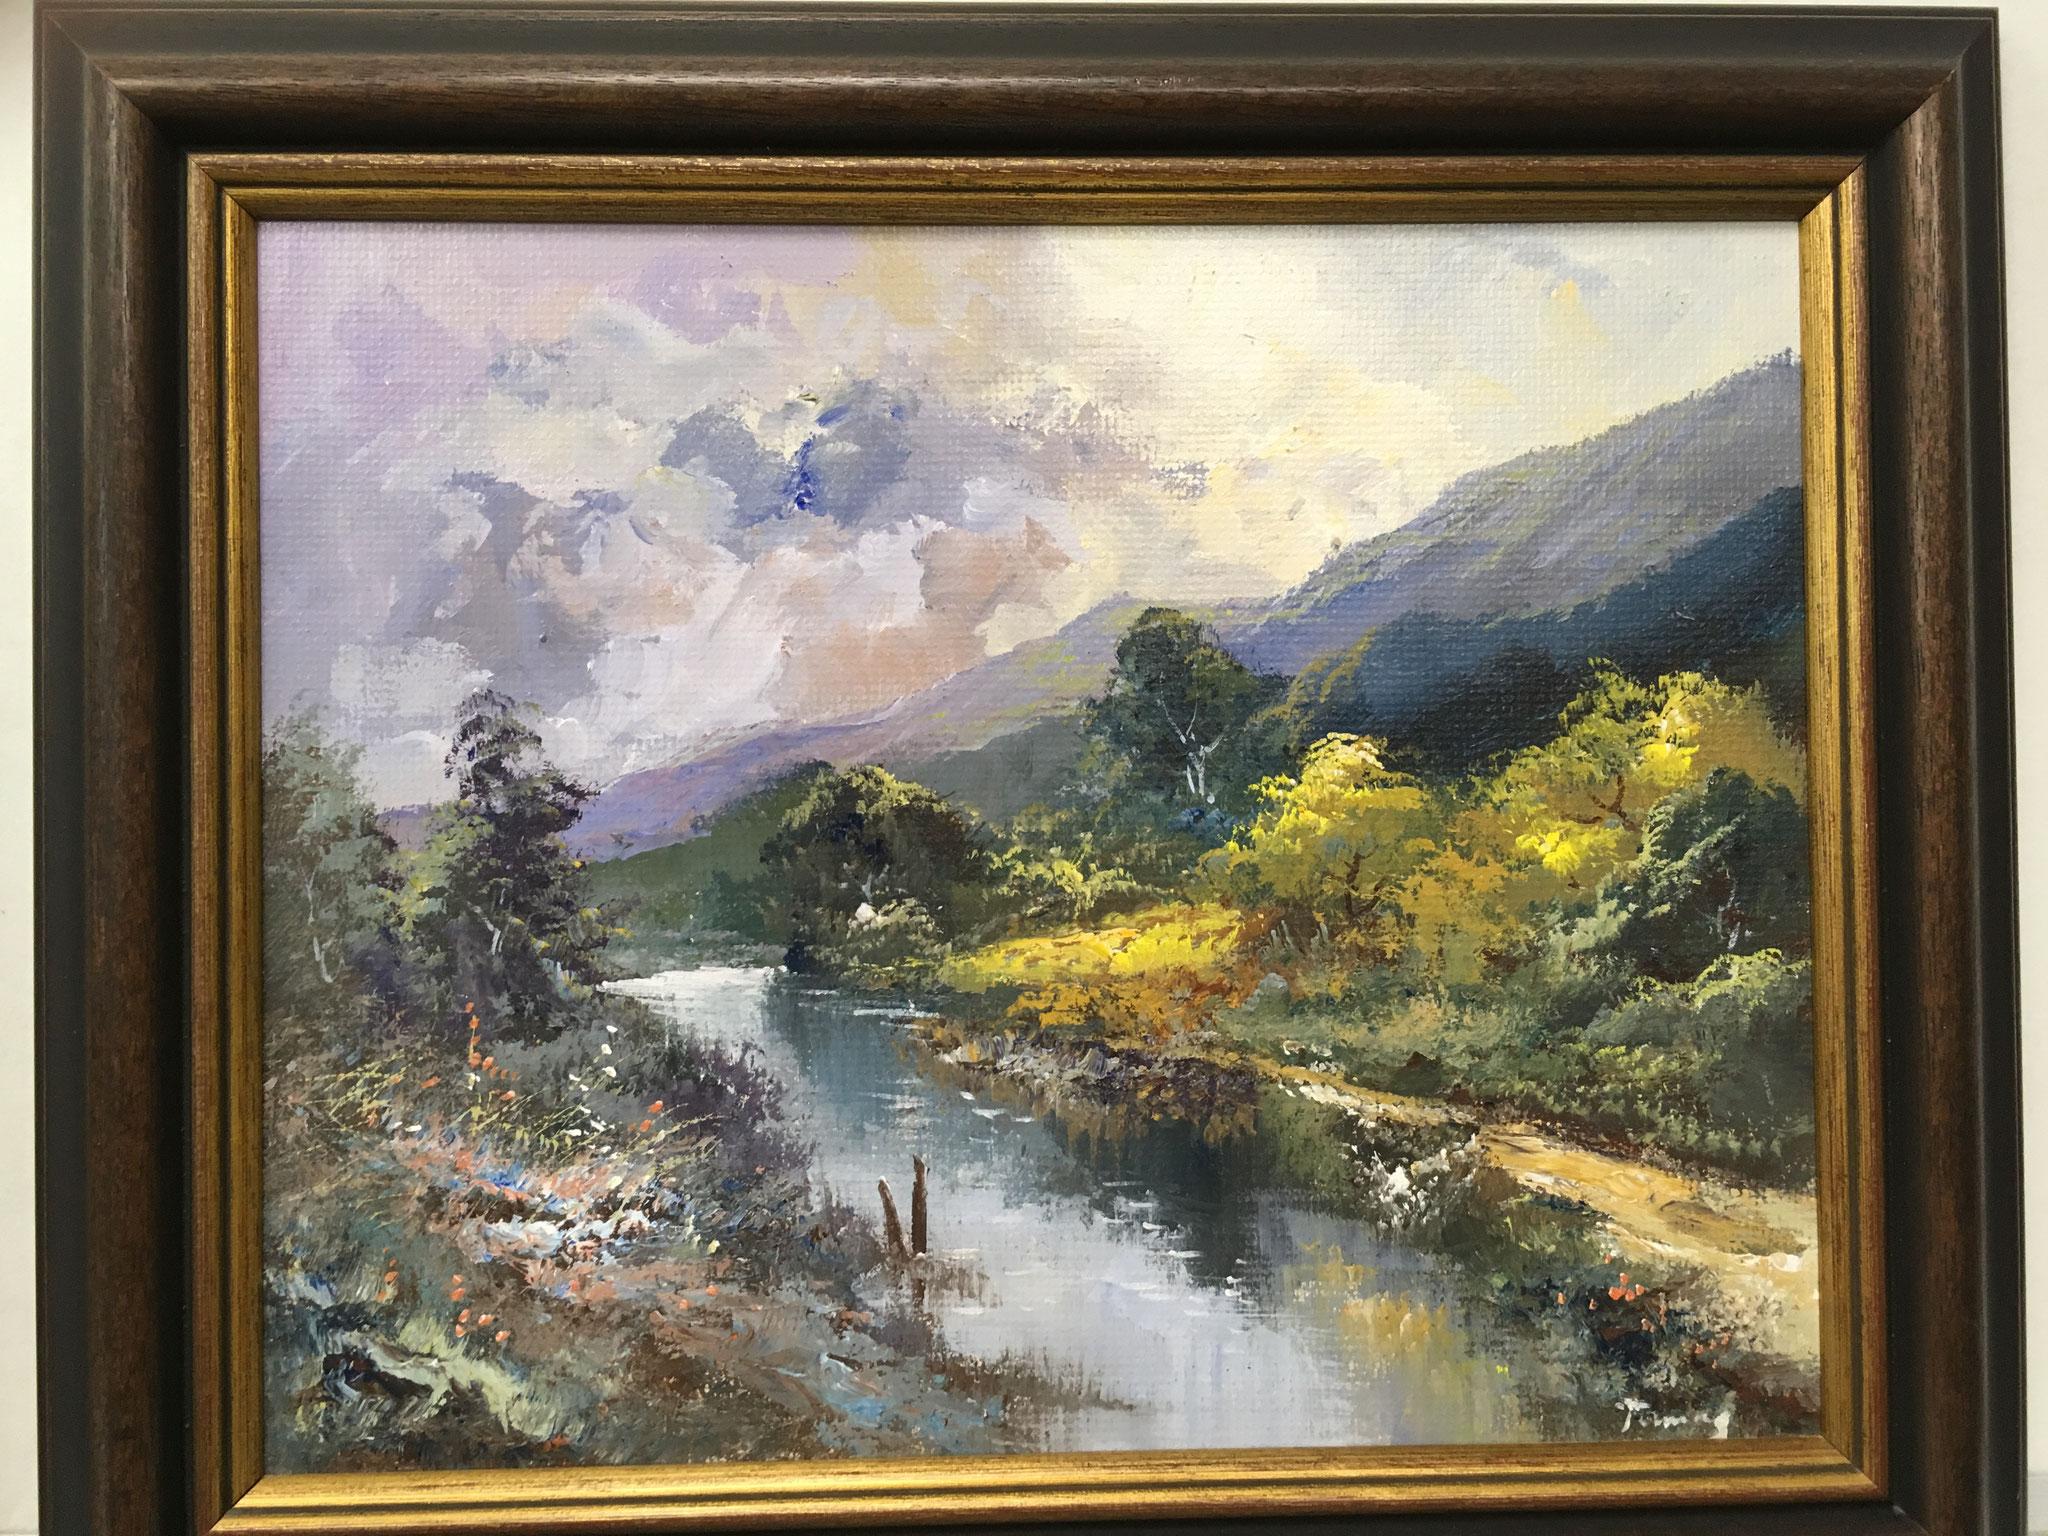 "Künstler unbekannt Original Acrylbild ""Landschaft II"" Größe/Falzmaß: 41,0 x 33,0cm Sonderpreis € 249,-"